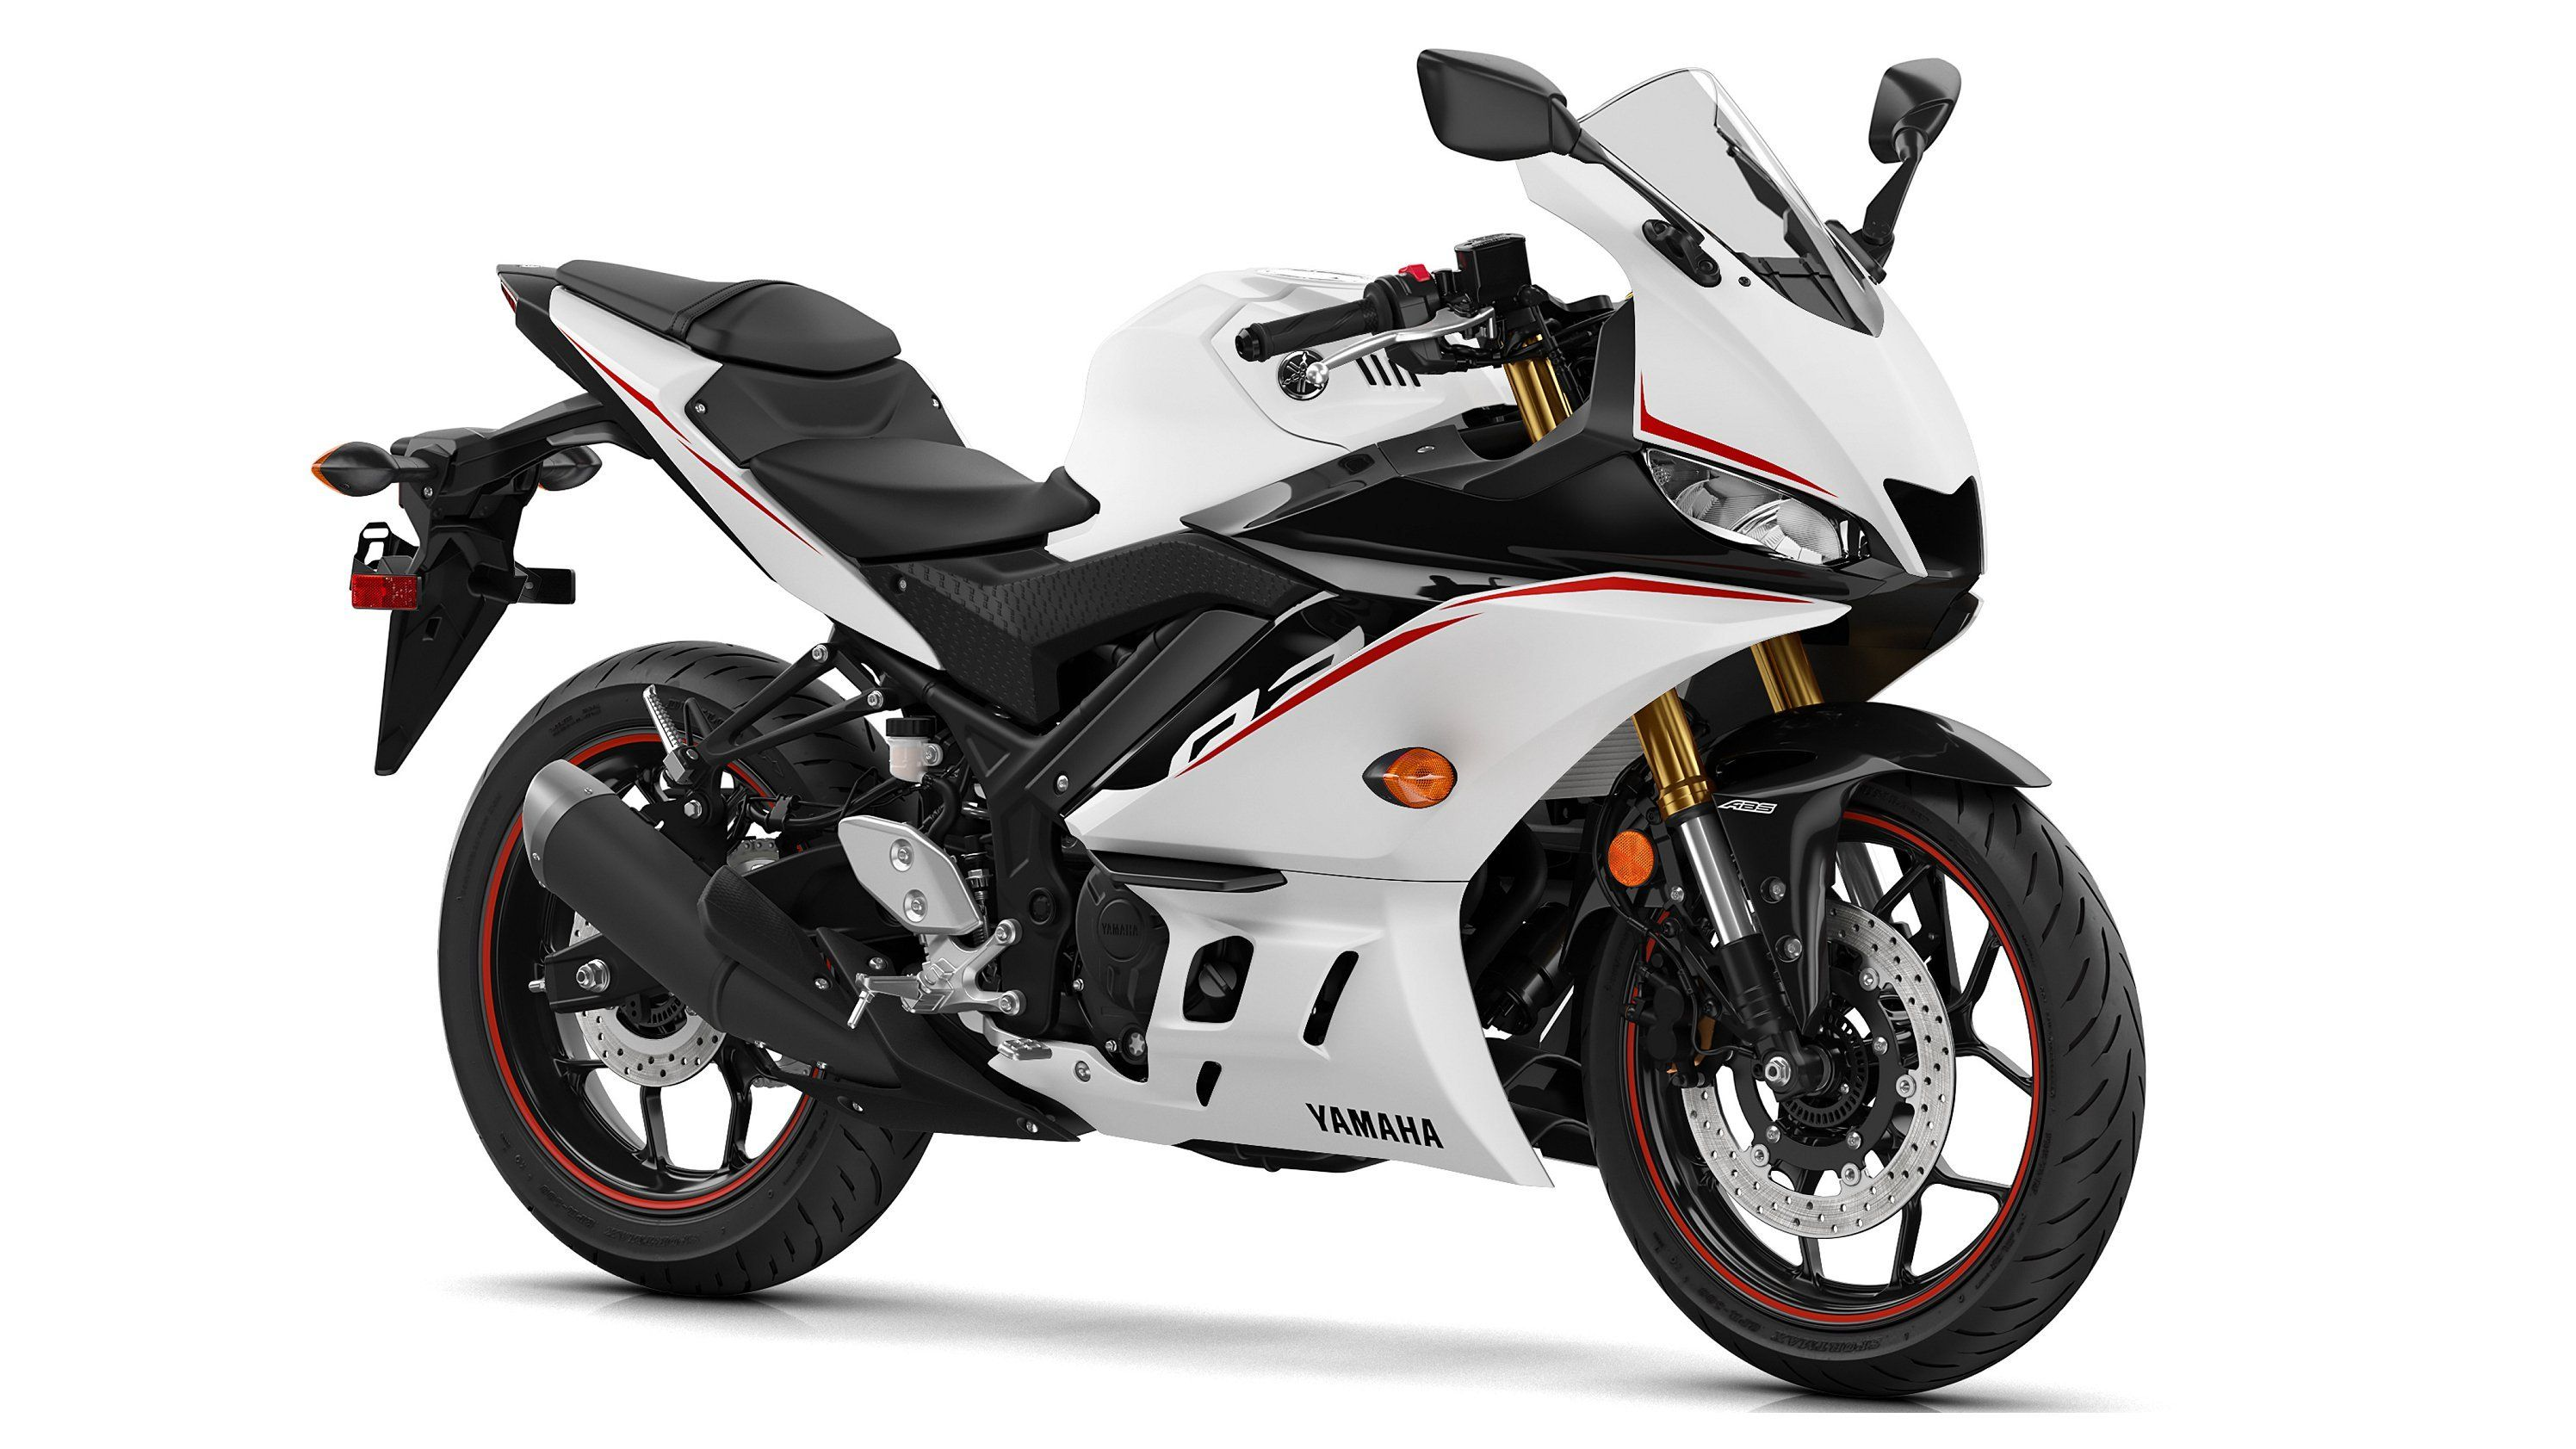 2019 Yamaha Yzf R3 Top Speed Inside 2019 Yamaha R3 From 2019